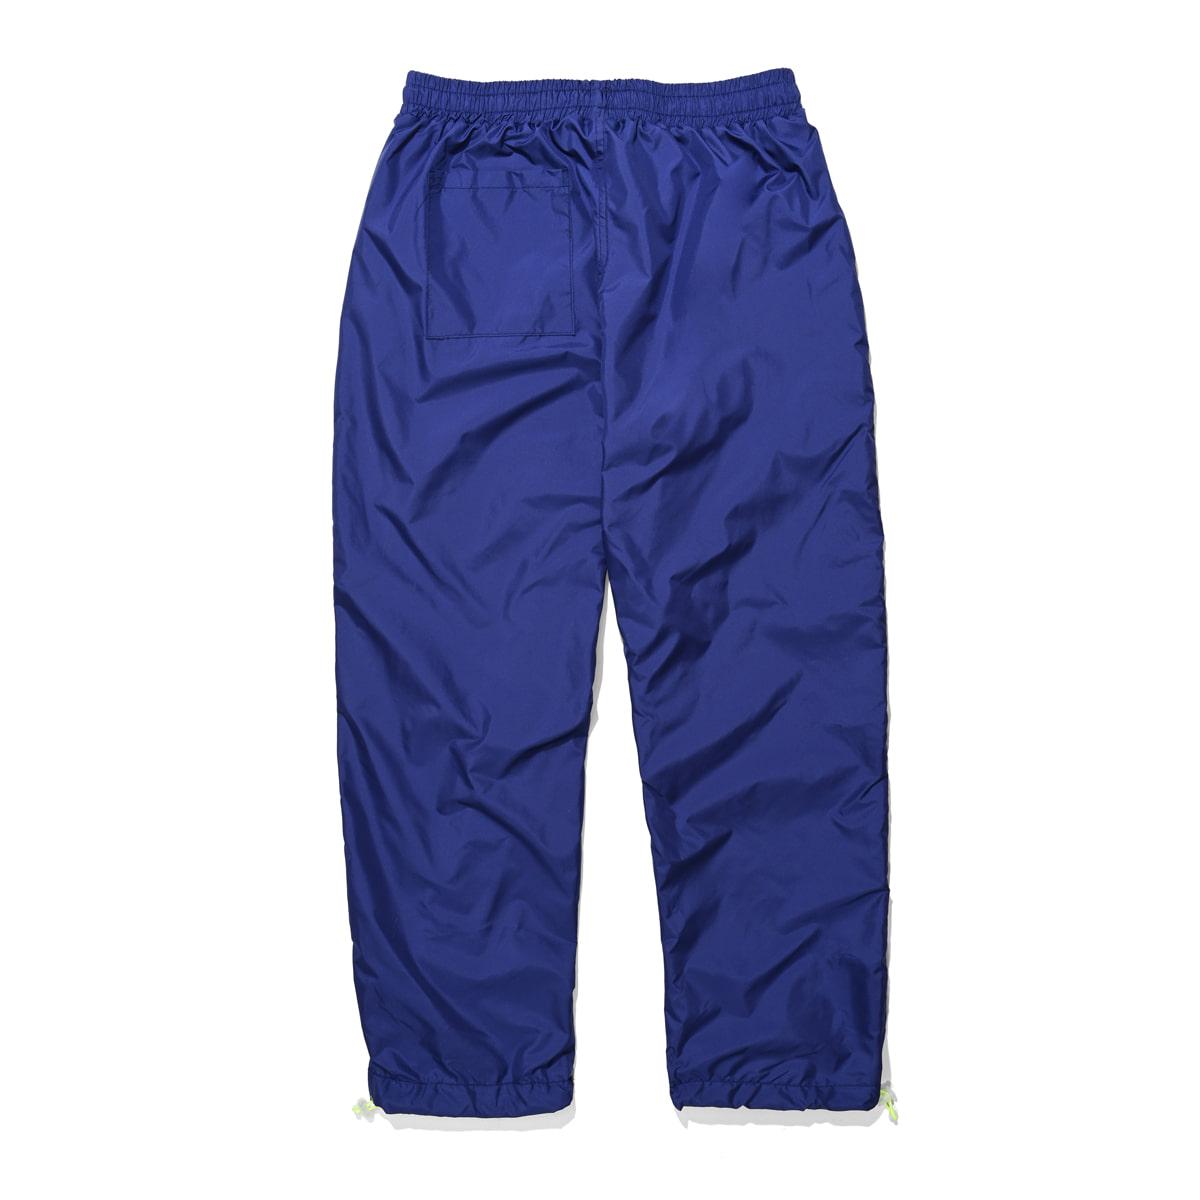 3M track pants (navy)